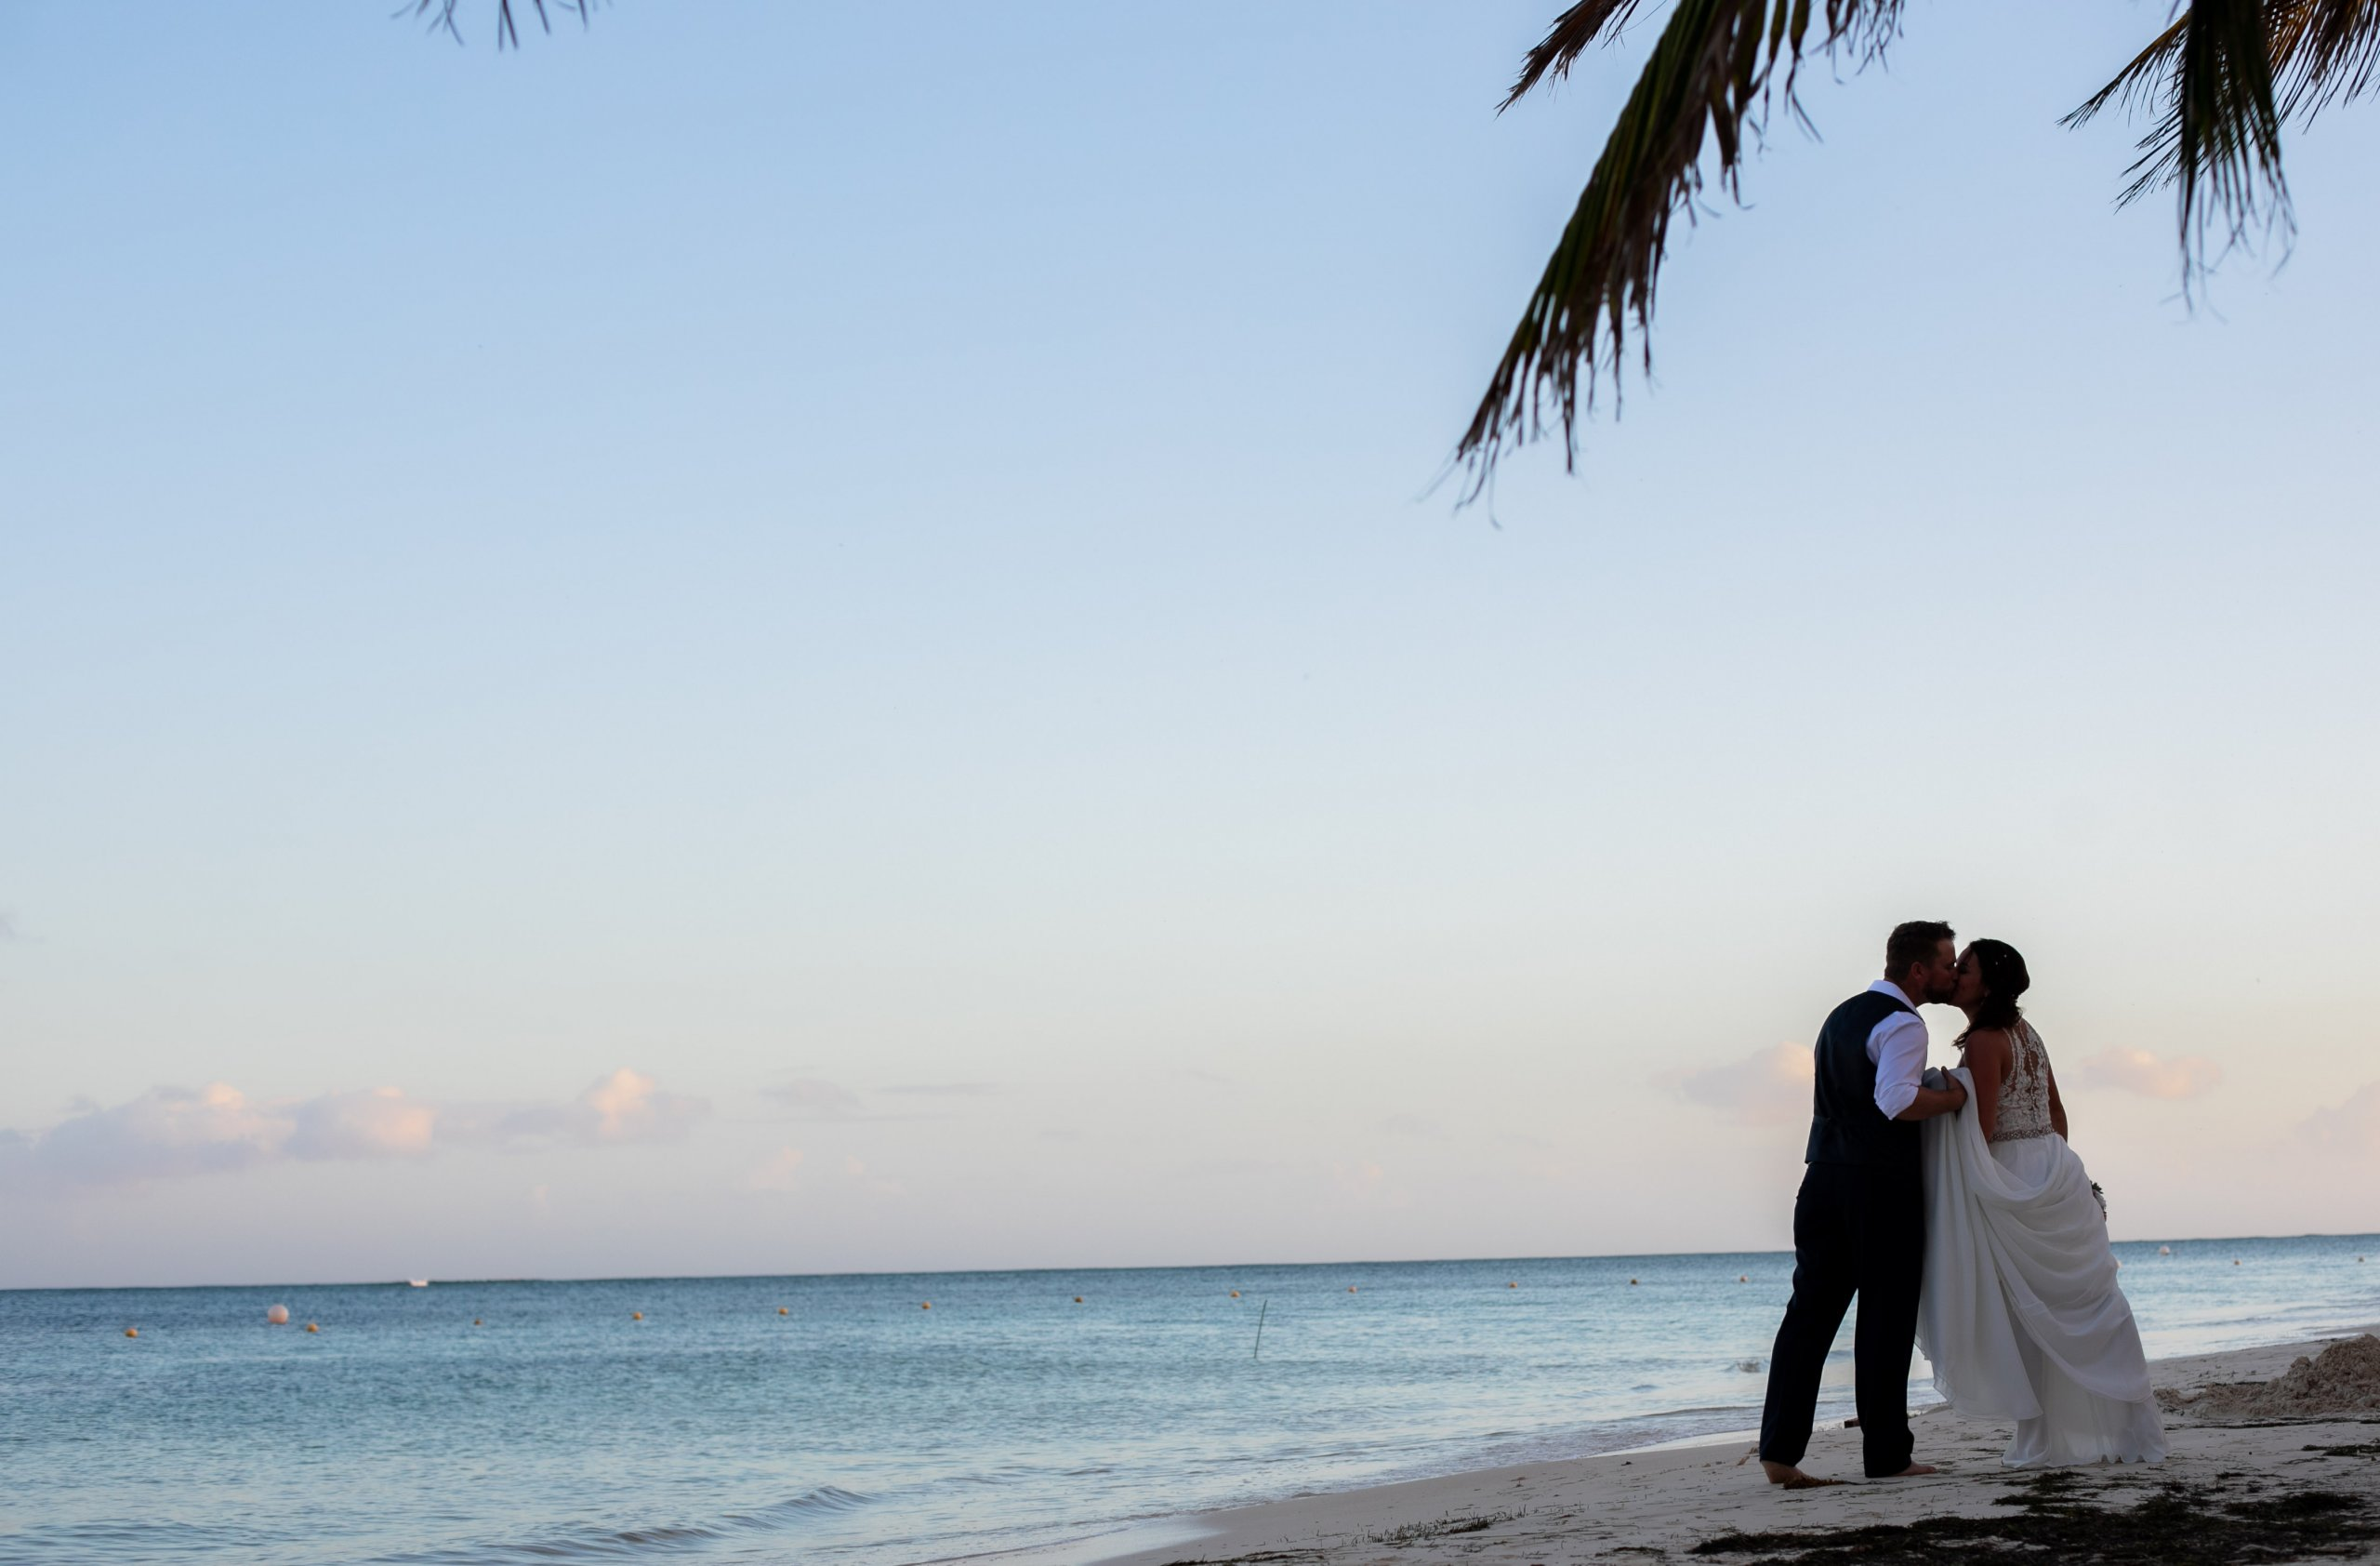 Beth Rob Margaritaville Island Reserve Riviera Cancun Wedding 43 scaled - Beth & Rob - Margaritaville Island Reserve